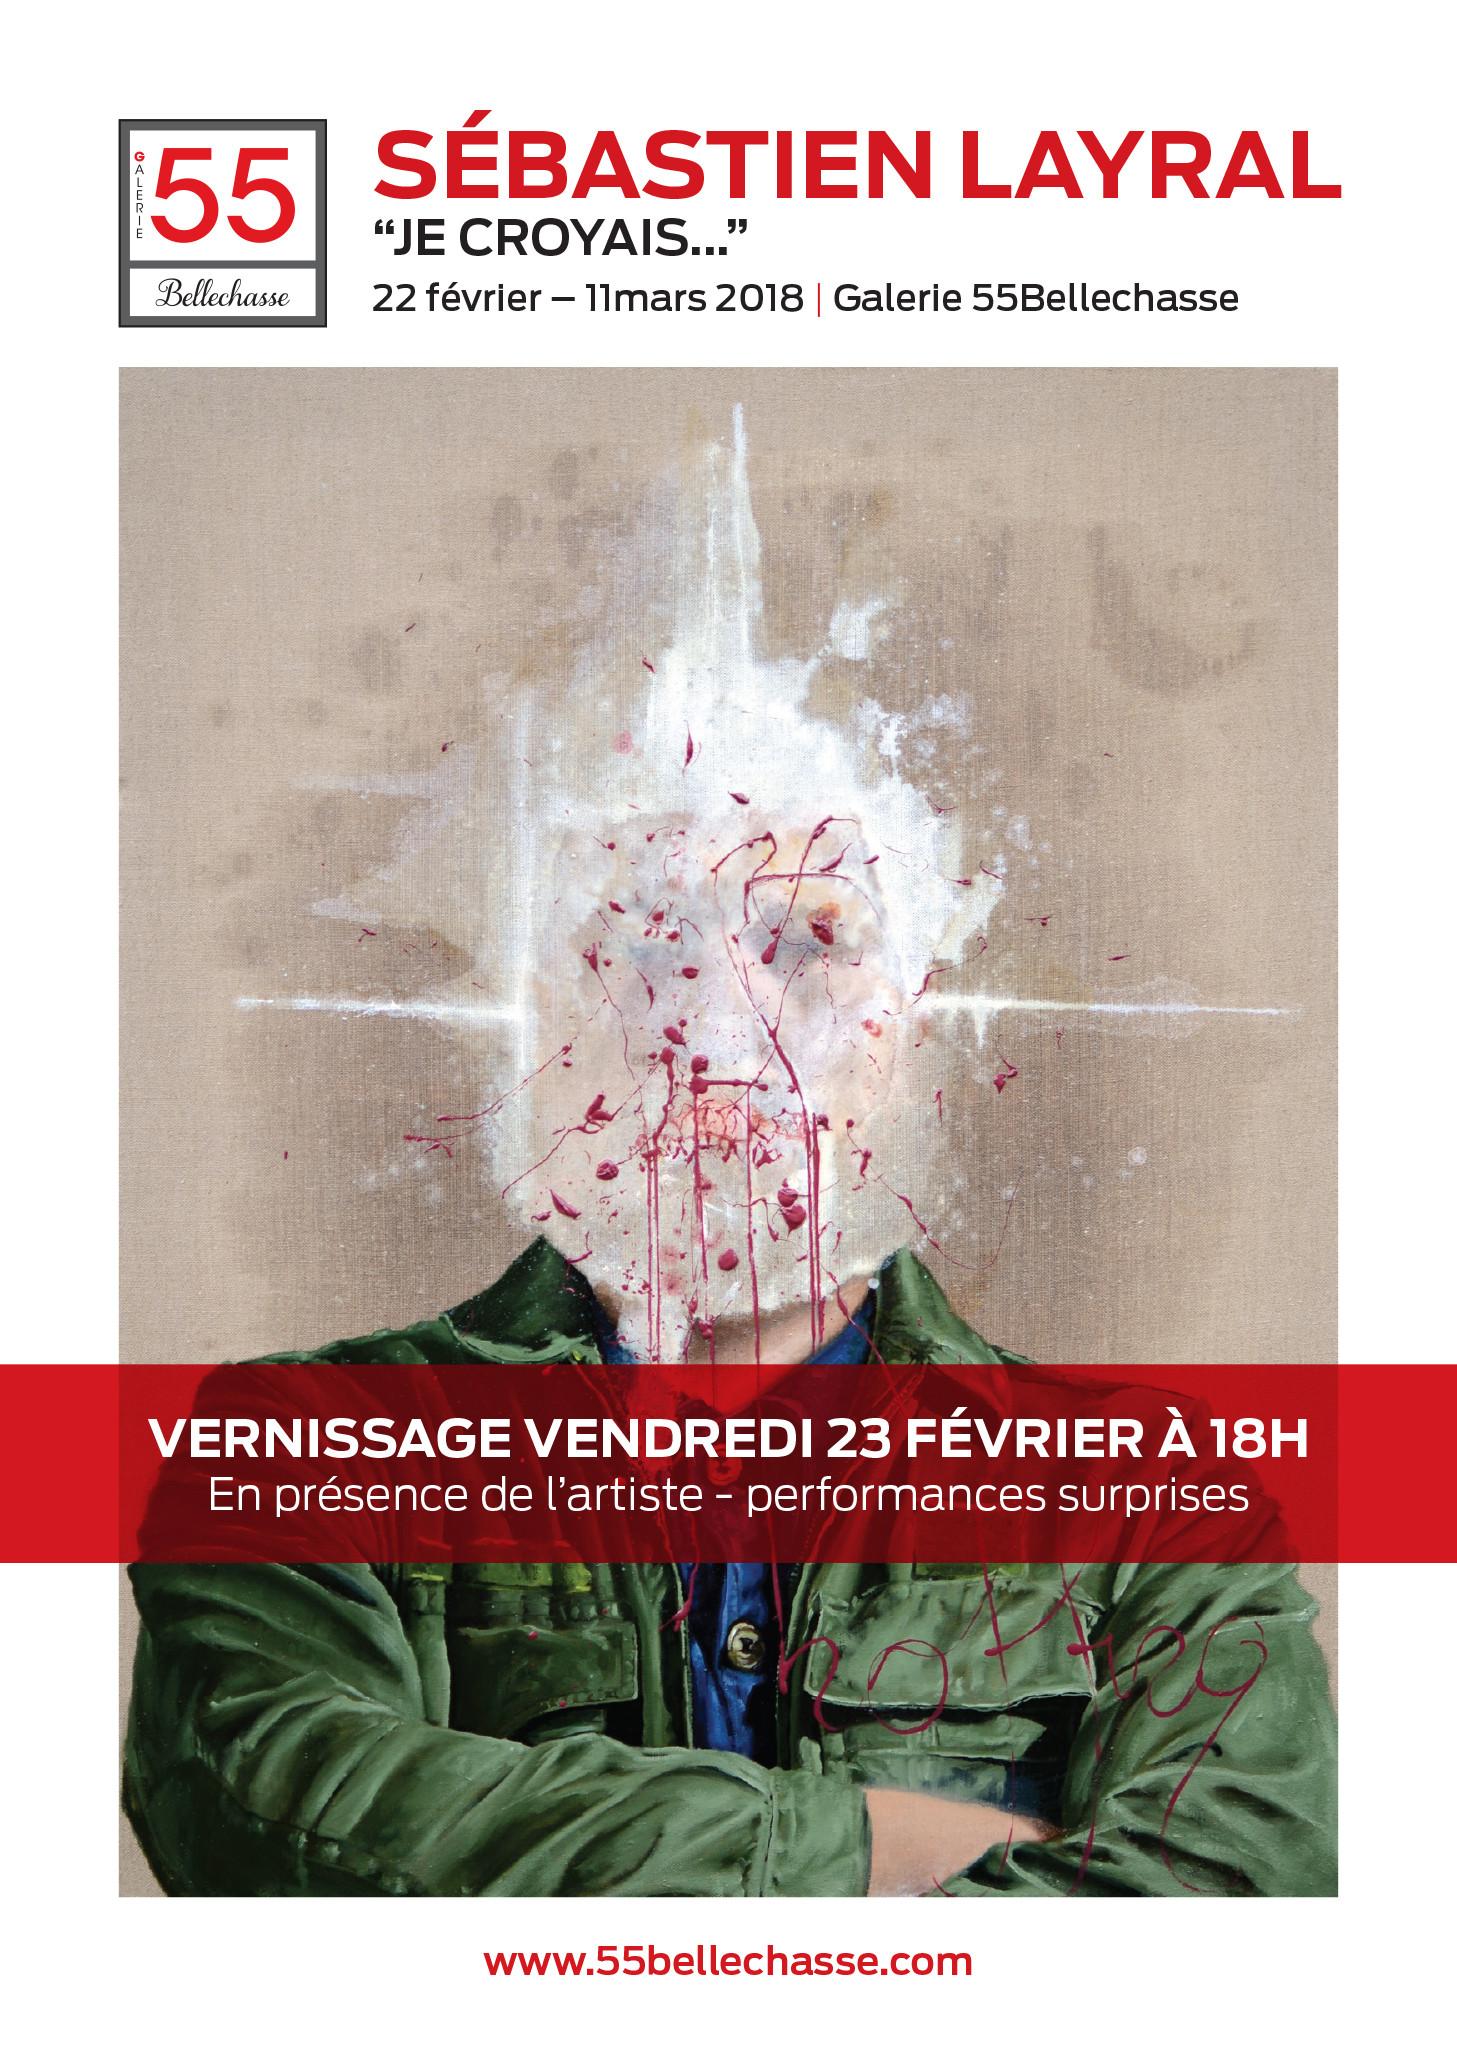 2018 Paris, Galerie 55 Bellechassee